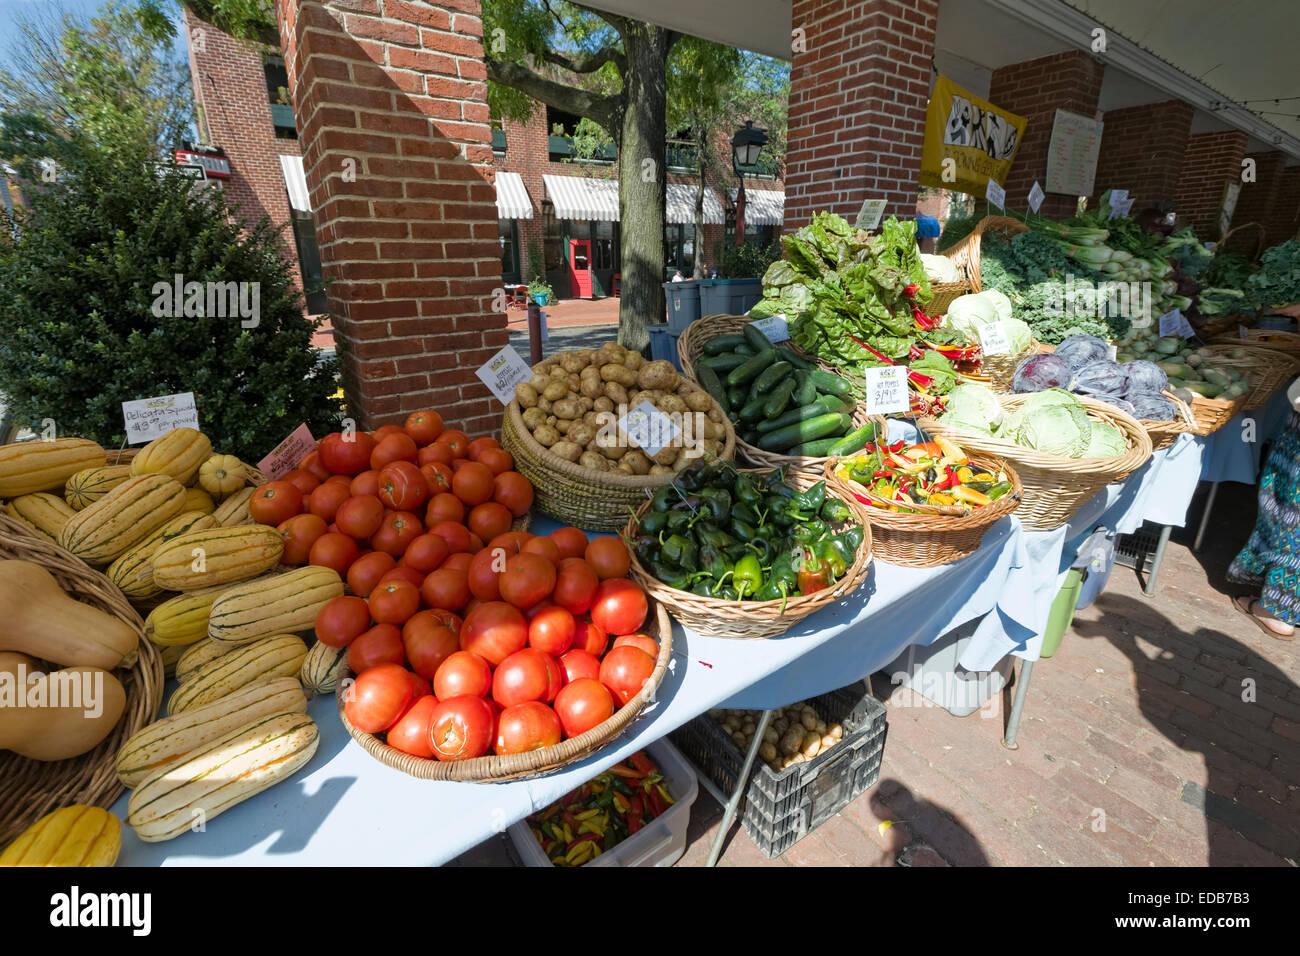 Farmers Market, Philadelphia, Pennsylvania - Stock Image